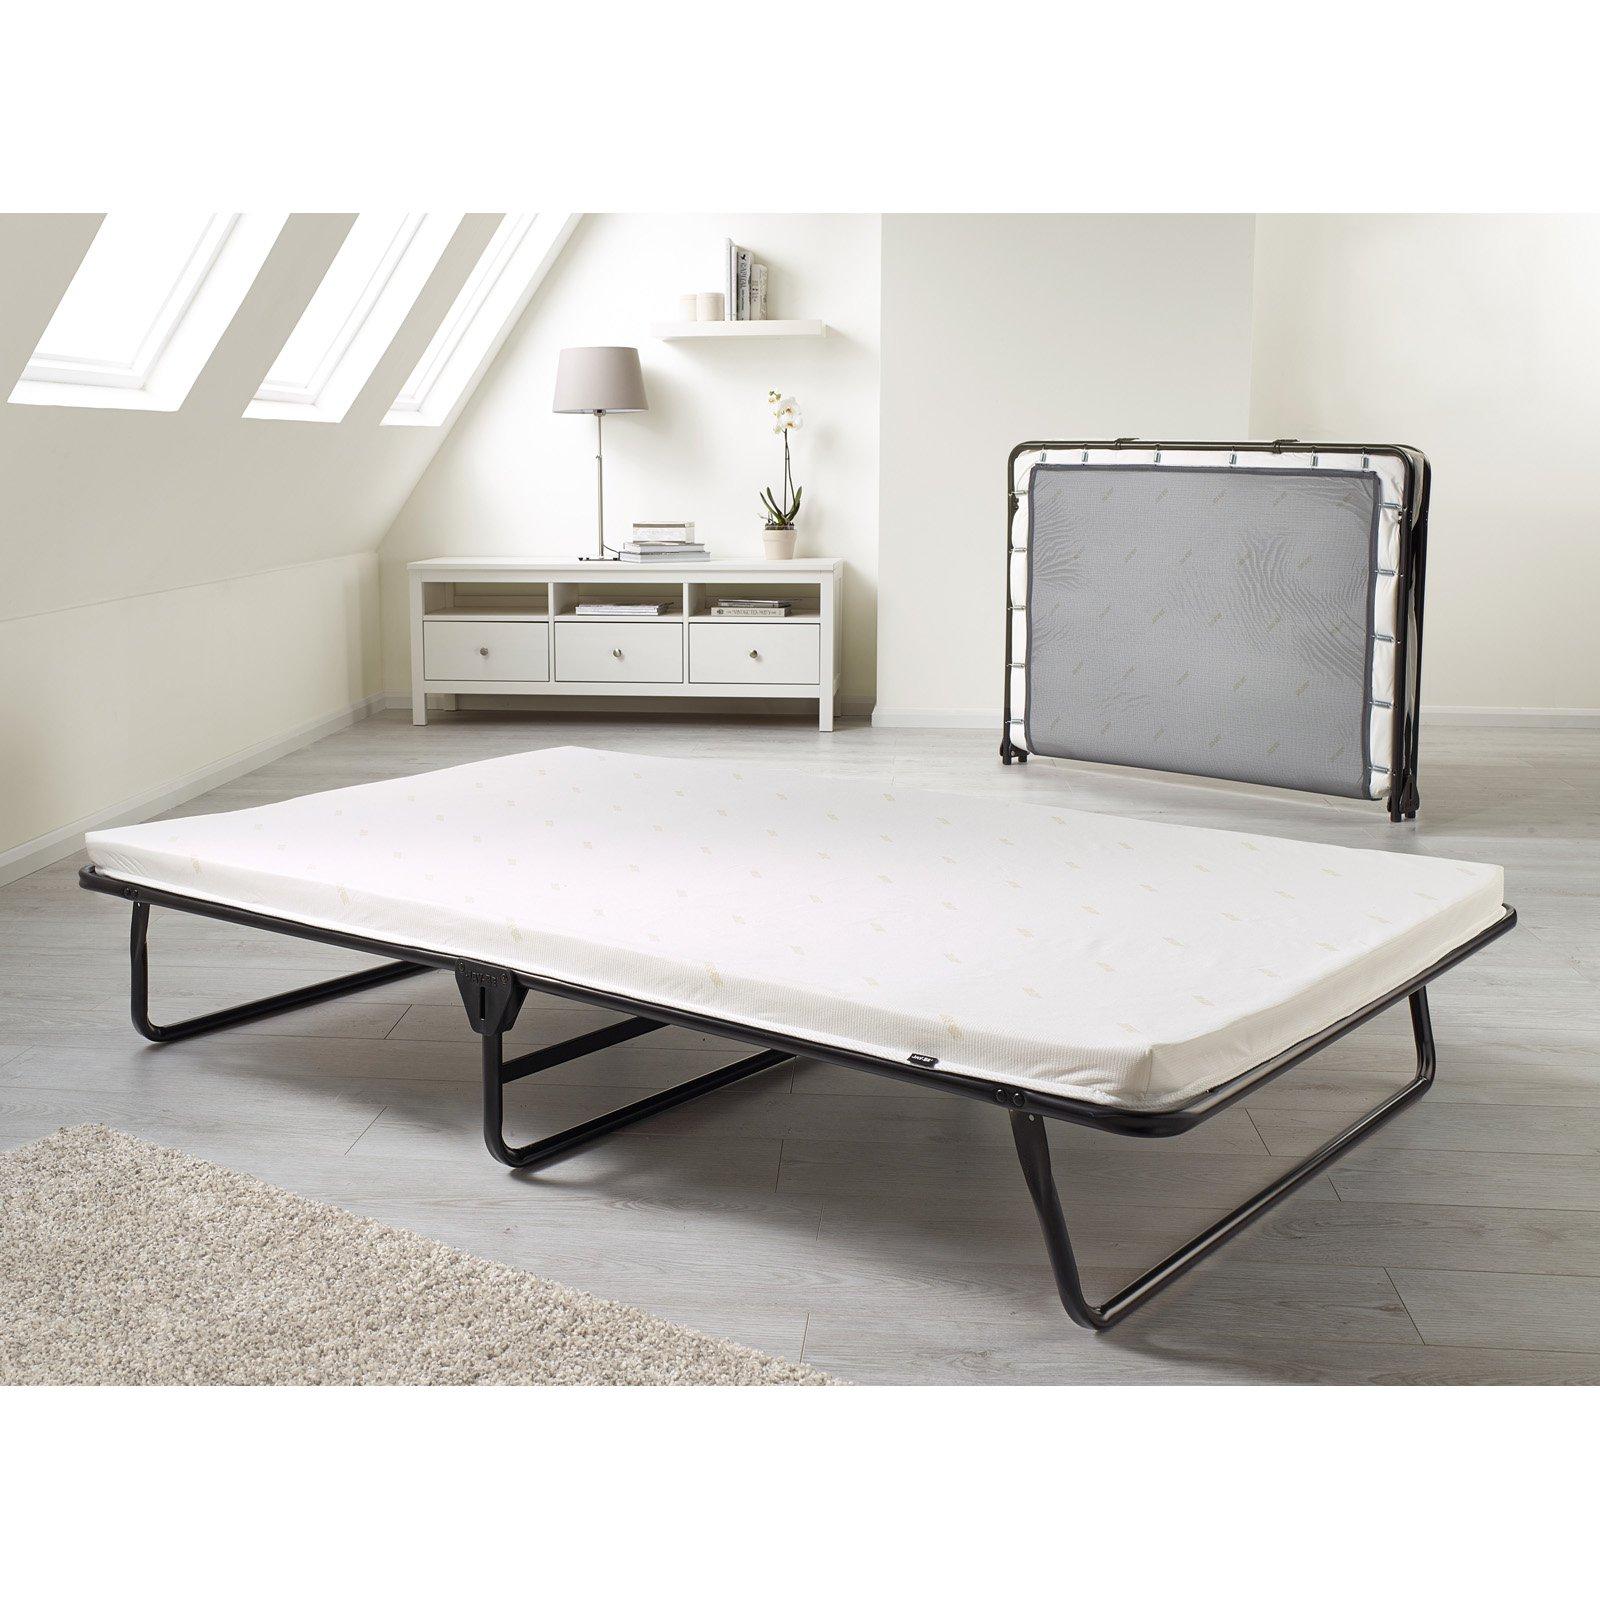 JAY-BE Saver Memory Foam Folding Bed - Oversize